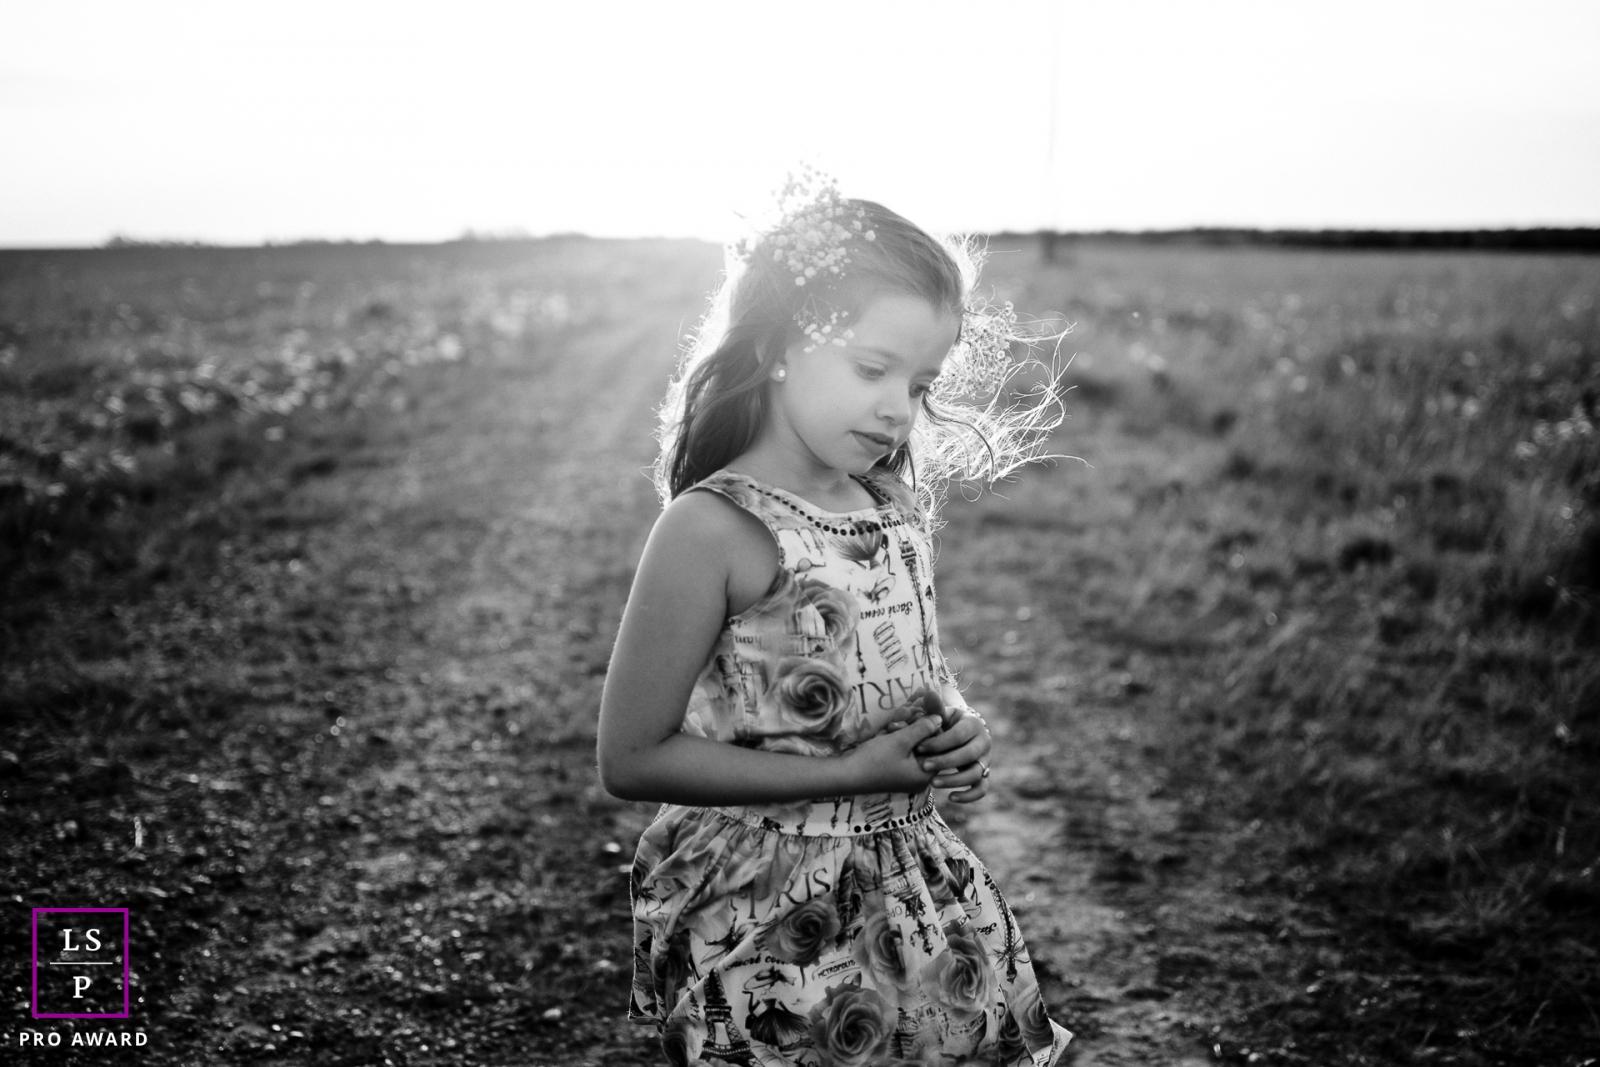 Nana Bonorino is a lifestyle photographer from Rio Grande do Sul